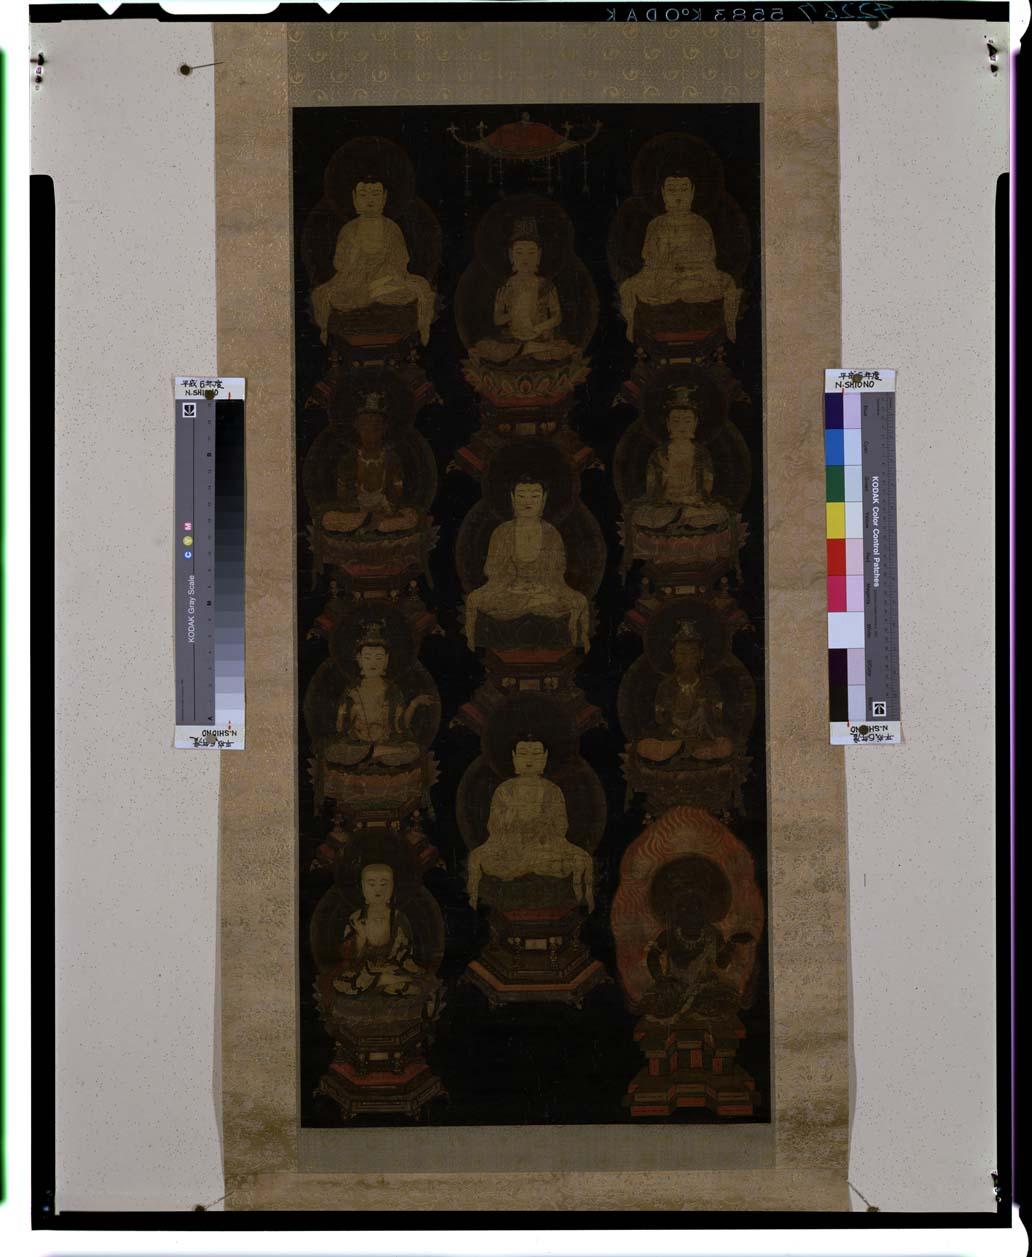 C0042267 十一仏図 - 東京国立博物館 画像検索